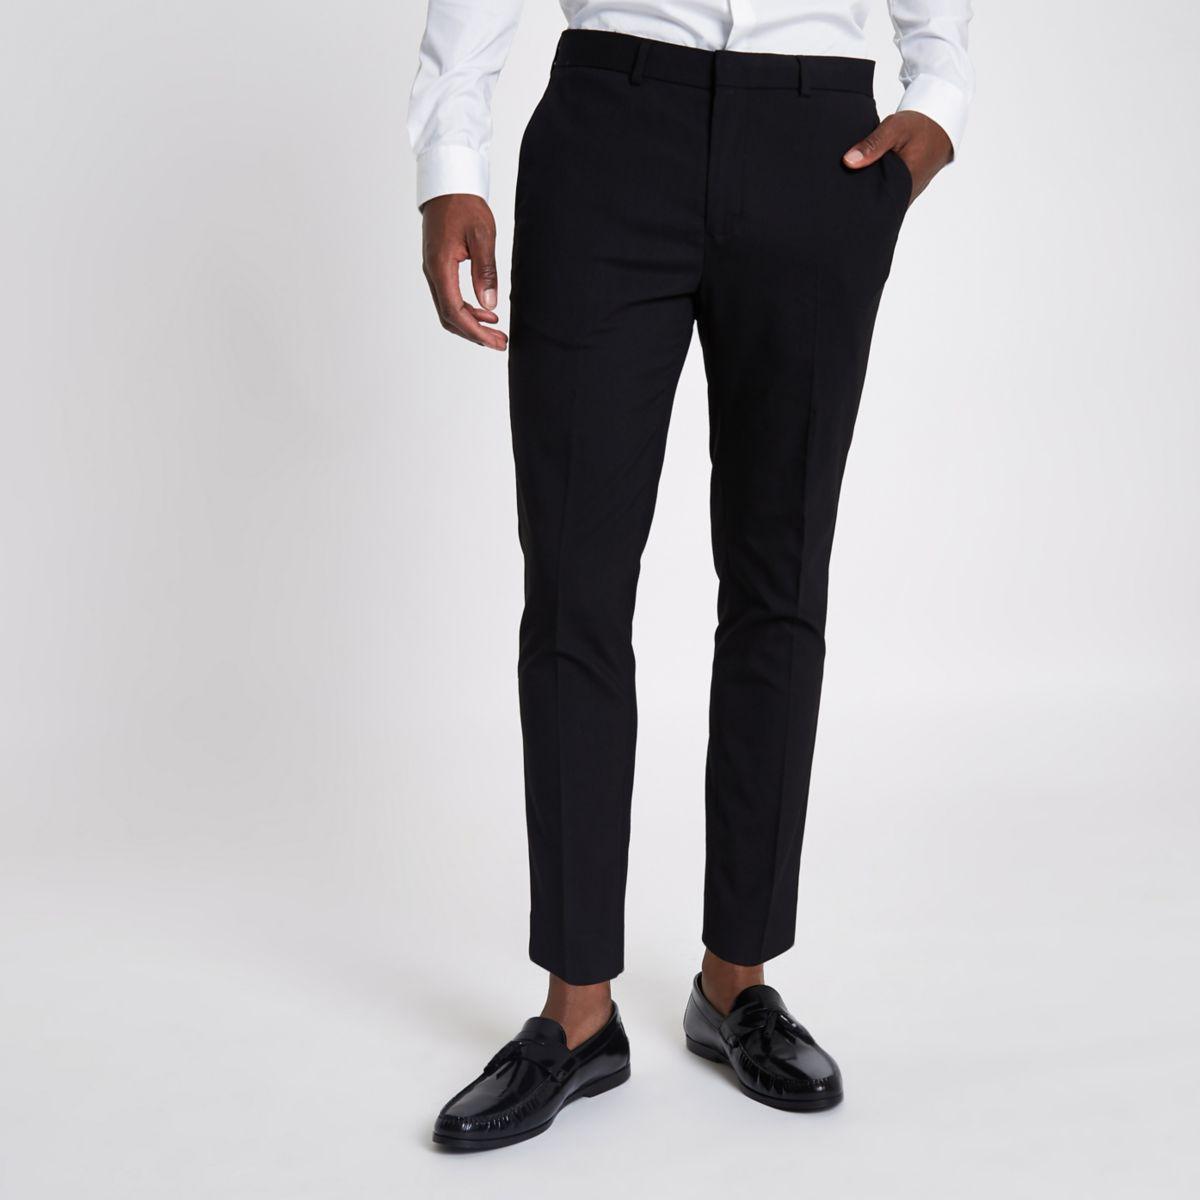 Pantalon skinny court habillé noir